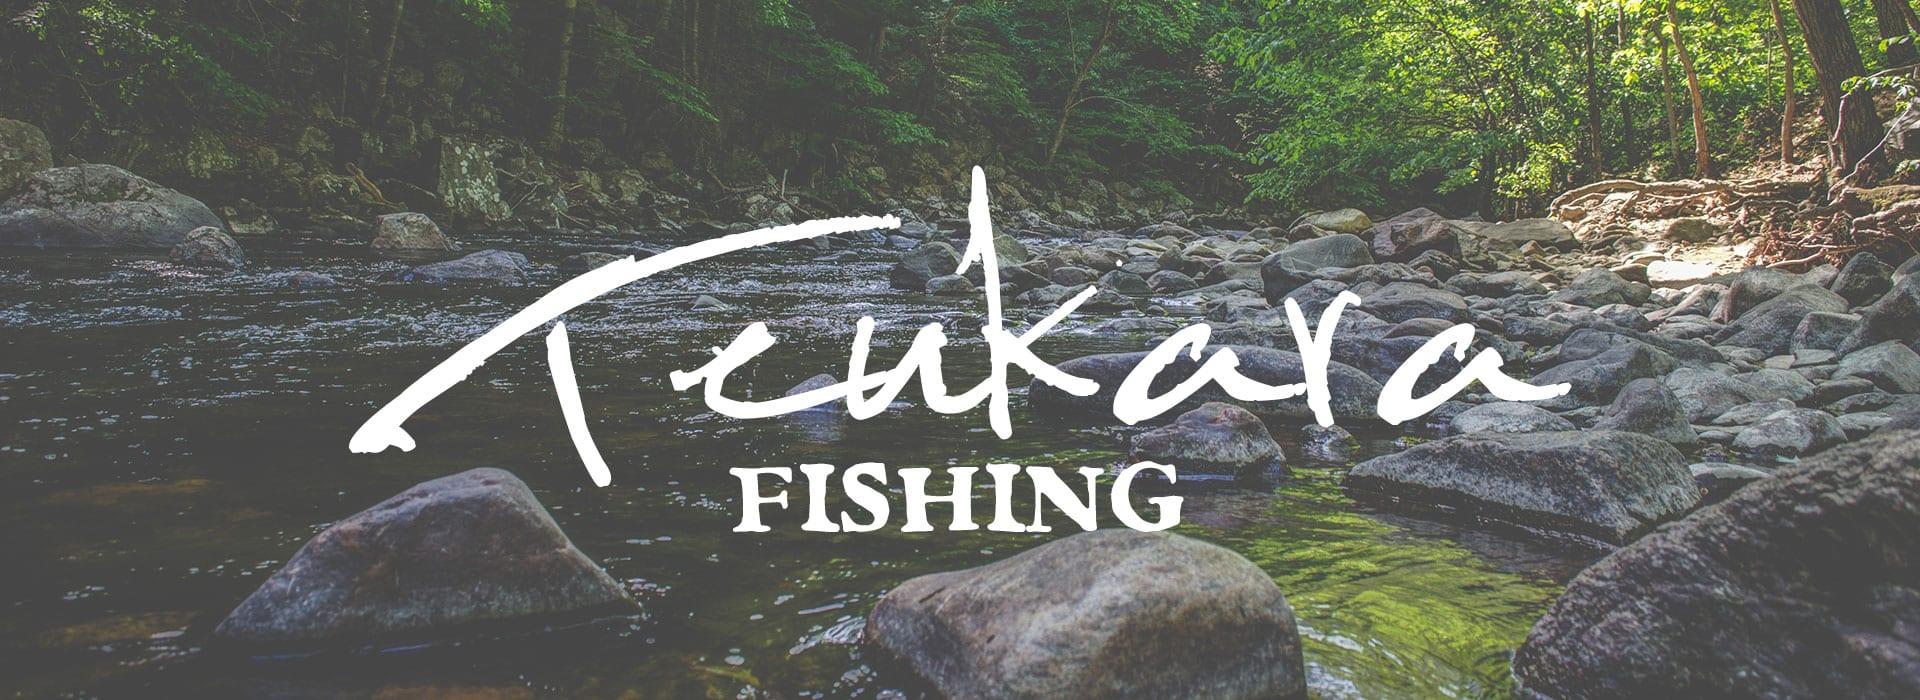 Tenkara Fishing